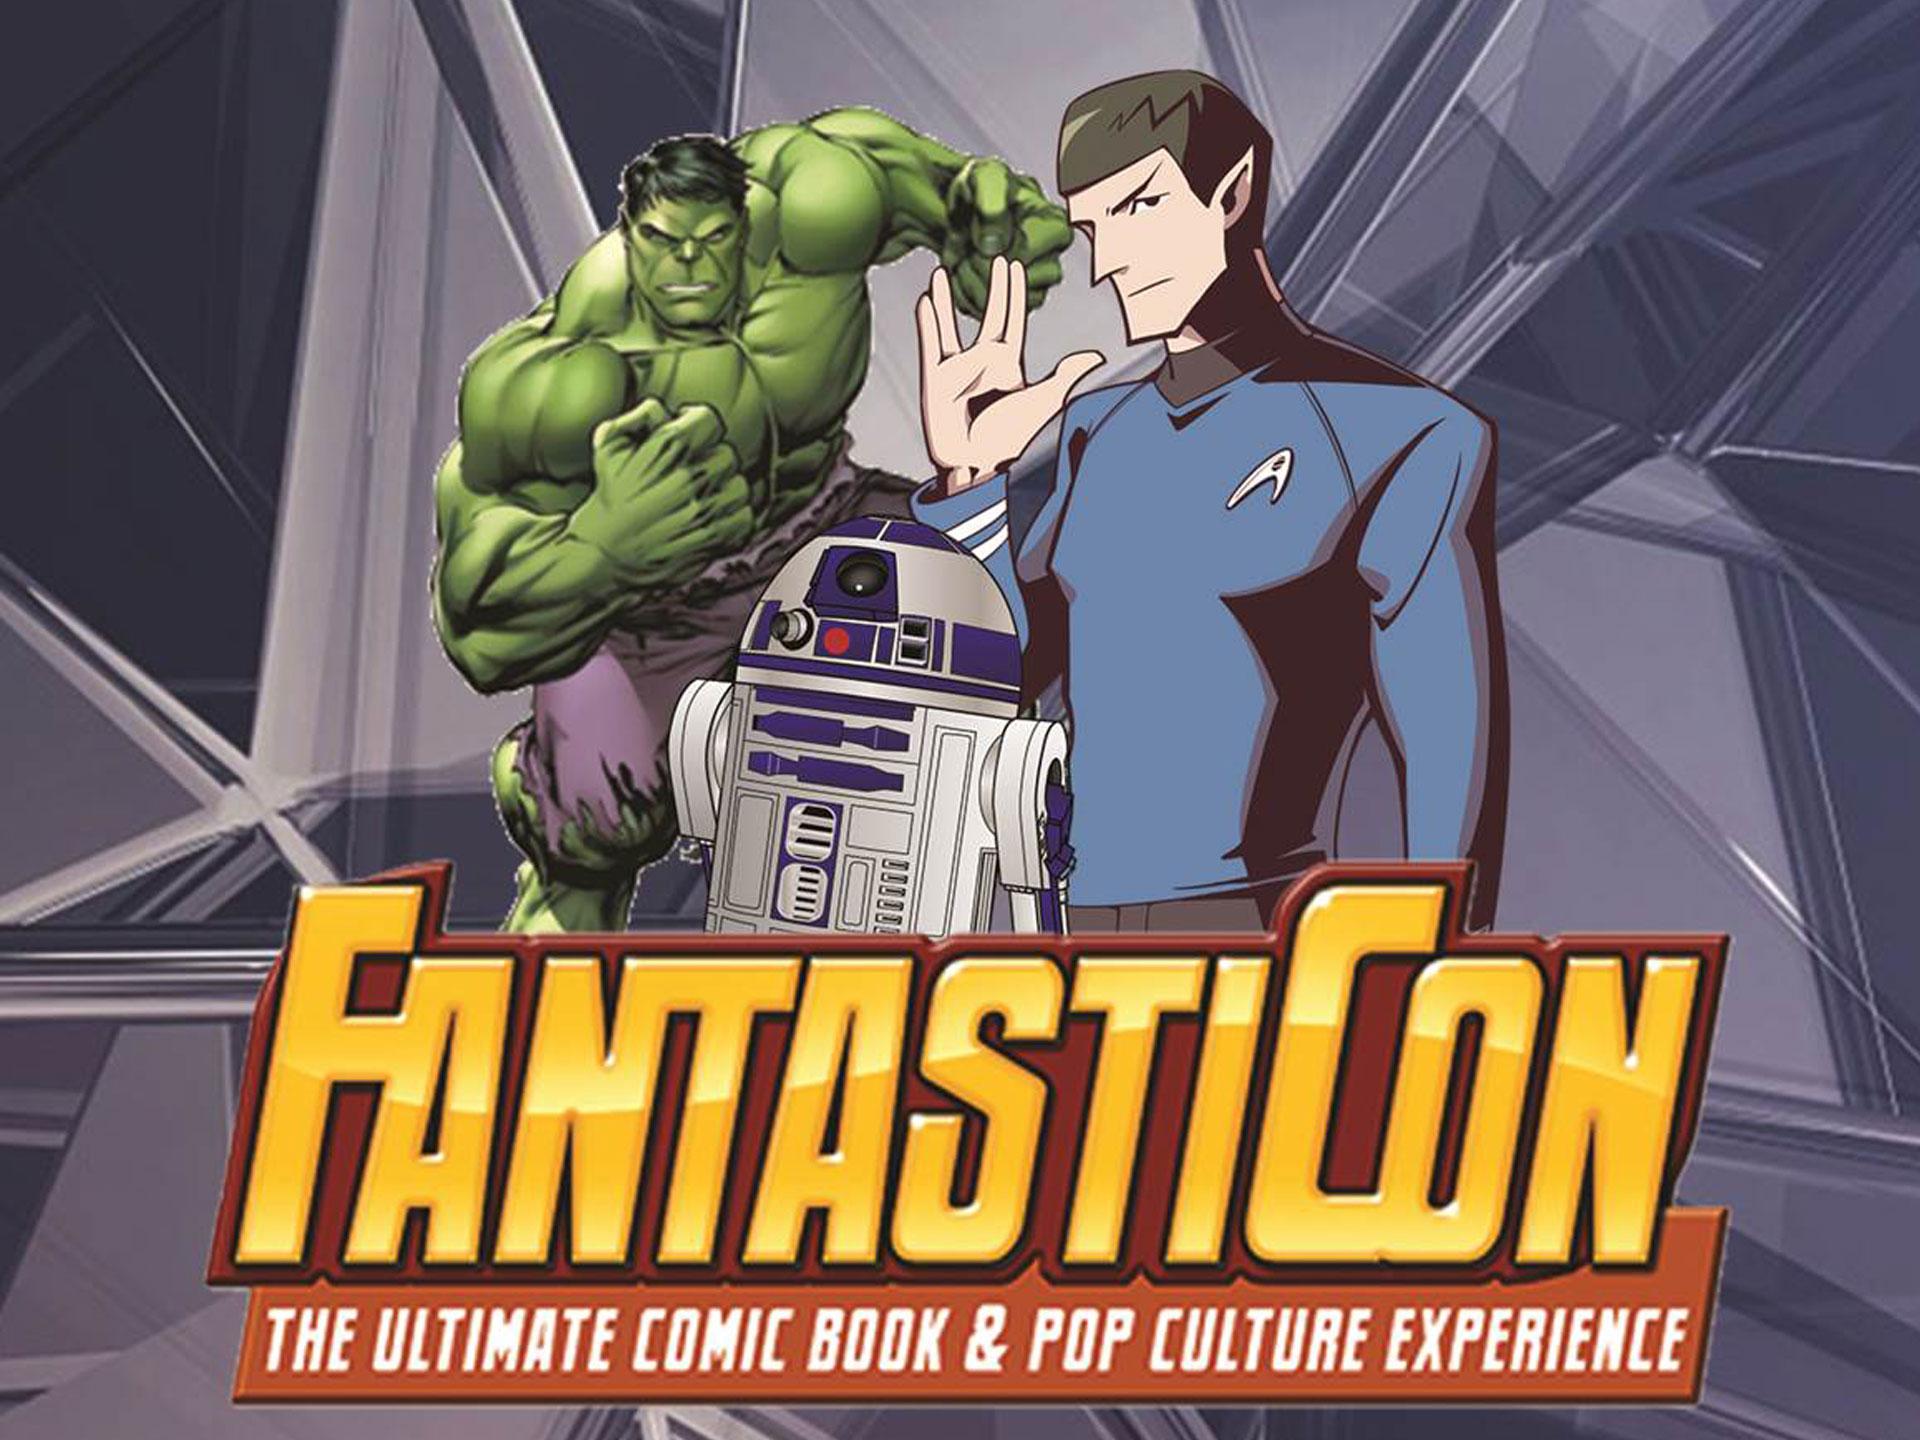 Image for FANTASTICON S7-EP22 - Saturday, October 19, 2019